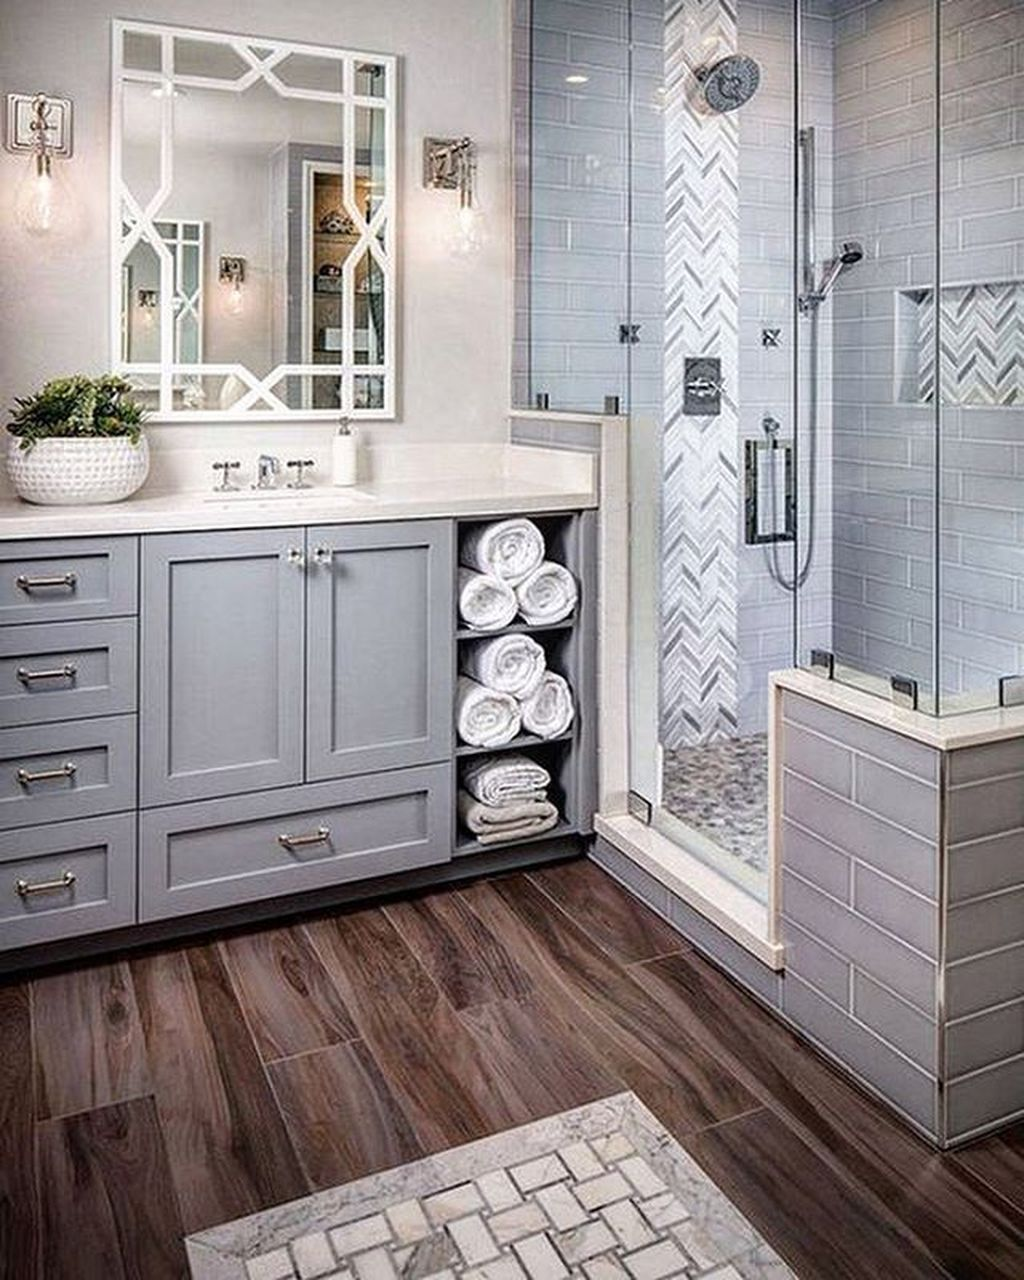 Rustic Farmhouse Bathroom Ideas: Rustic Farmhouse Style Bathroom Remodel Ideas (24